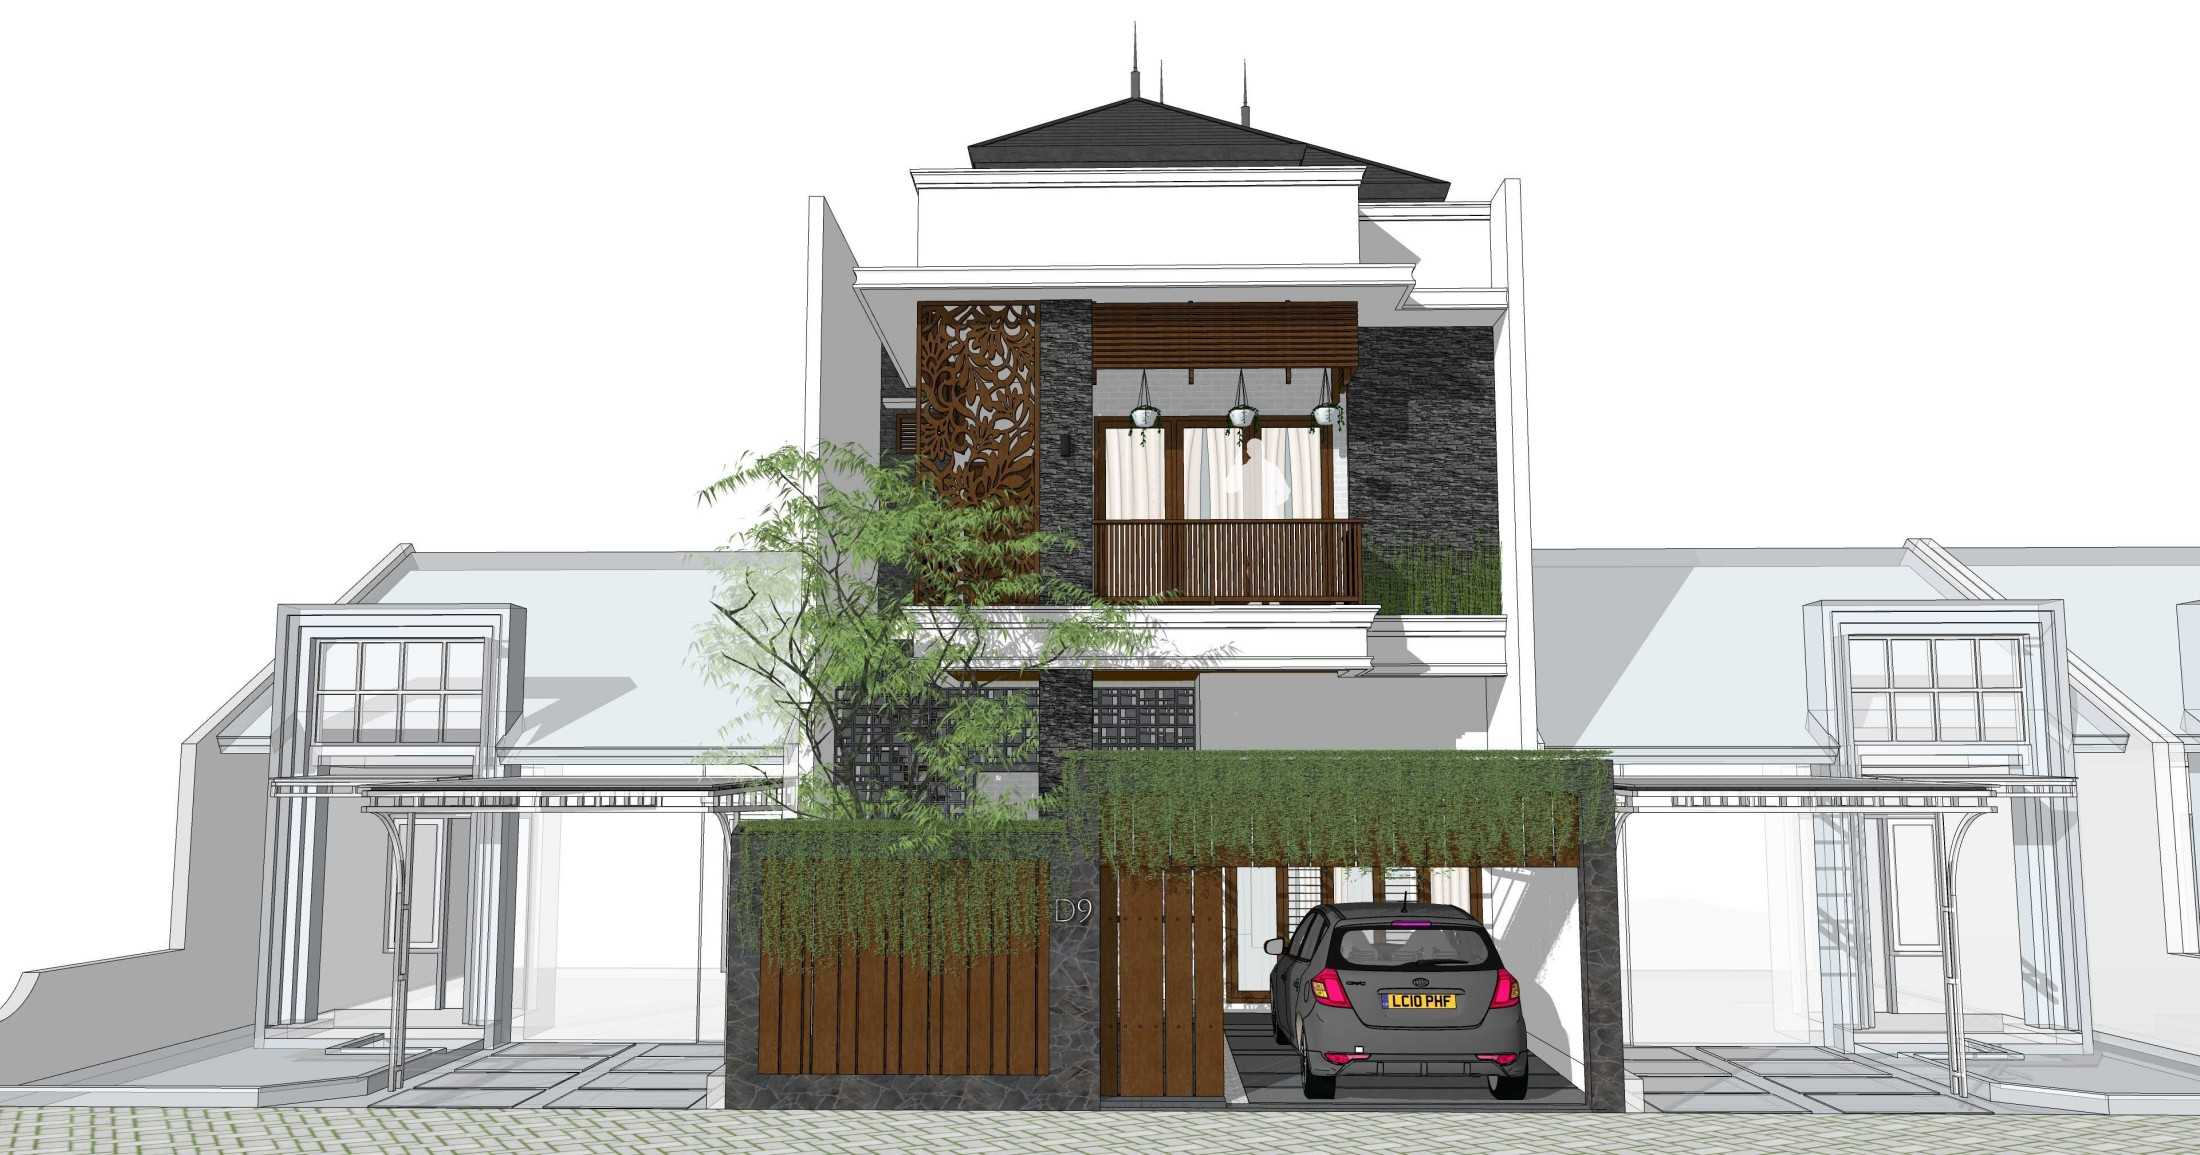 Miv Architect (Alfachri Kamarullah) El + House Barombong, Tamalate, Kota Makassar, Sulawesi Selatan, Indonesia Barombong, Tamalate, Kota Makassar, Sulawesi Selatan, Indonesia Alfachri-Kamarullah-El-House  59754